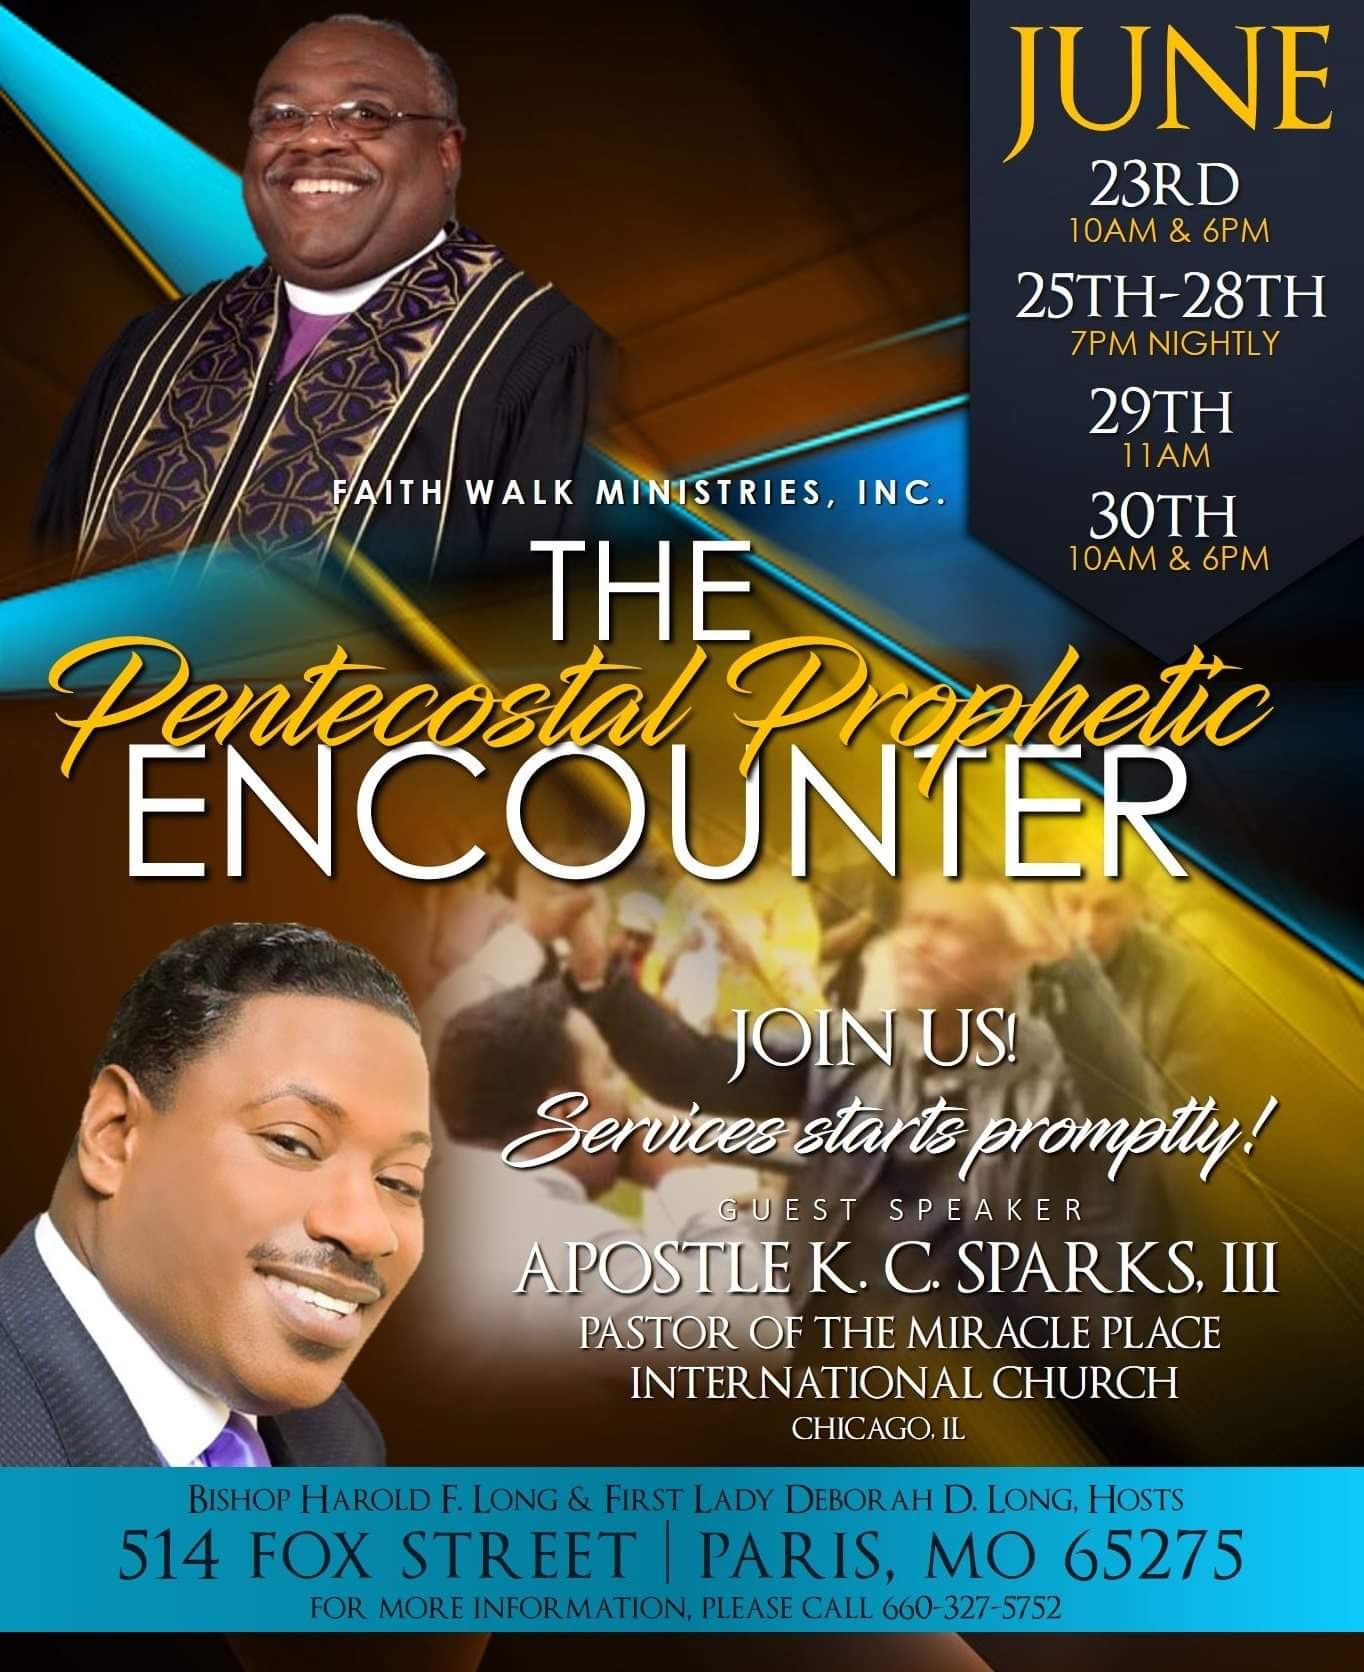 FaithWalk Ministries